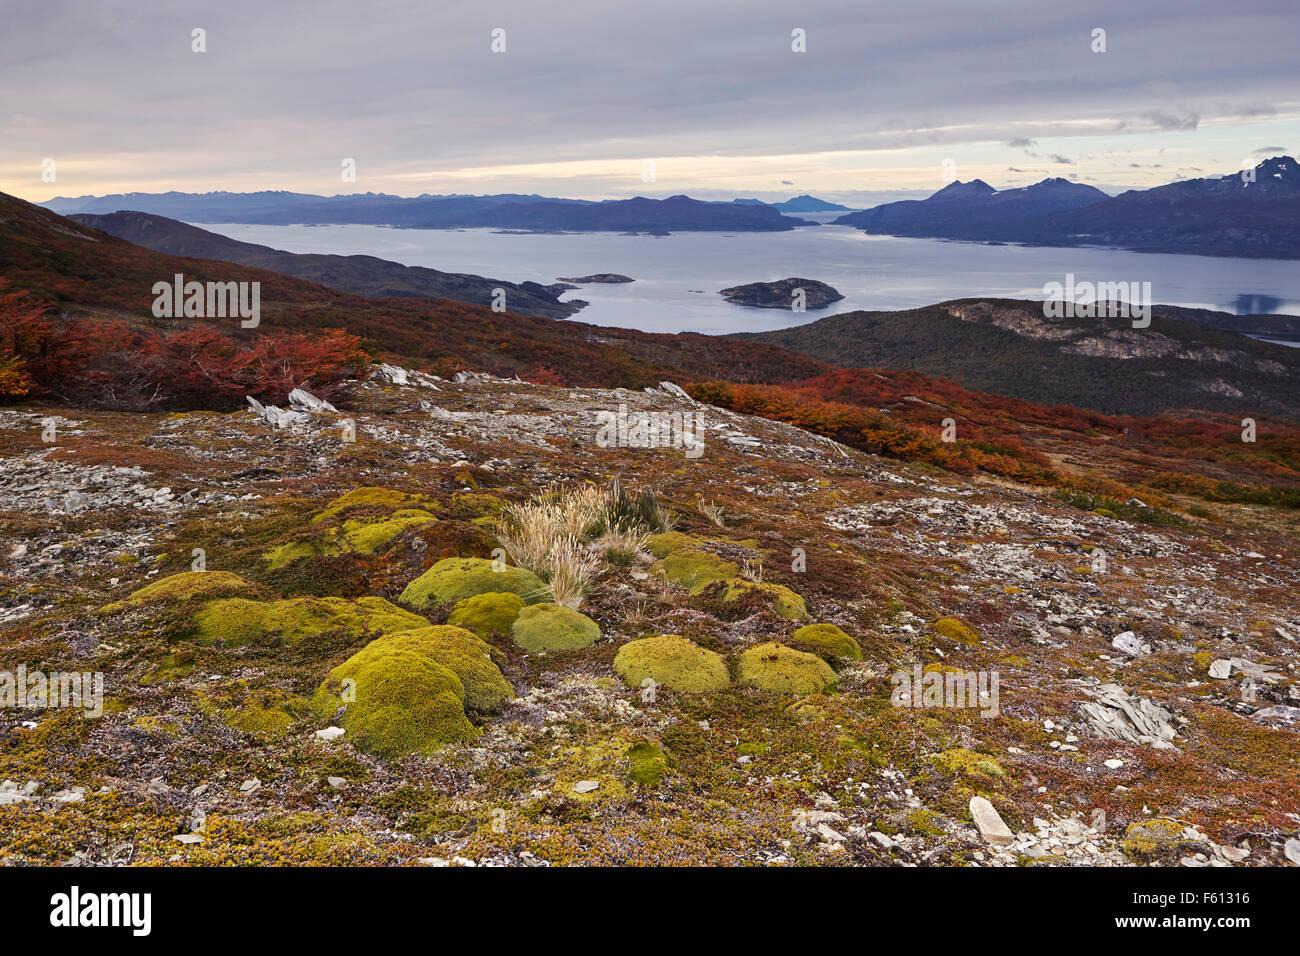 Canal Beagle Onashaga, Tierra del Fuego National Park, Argentina - Stock Image